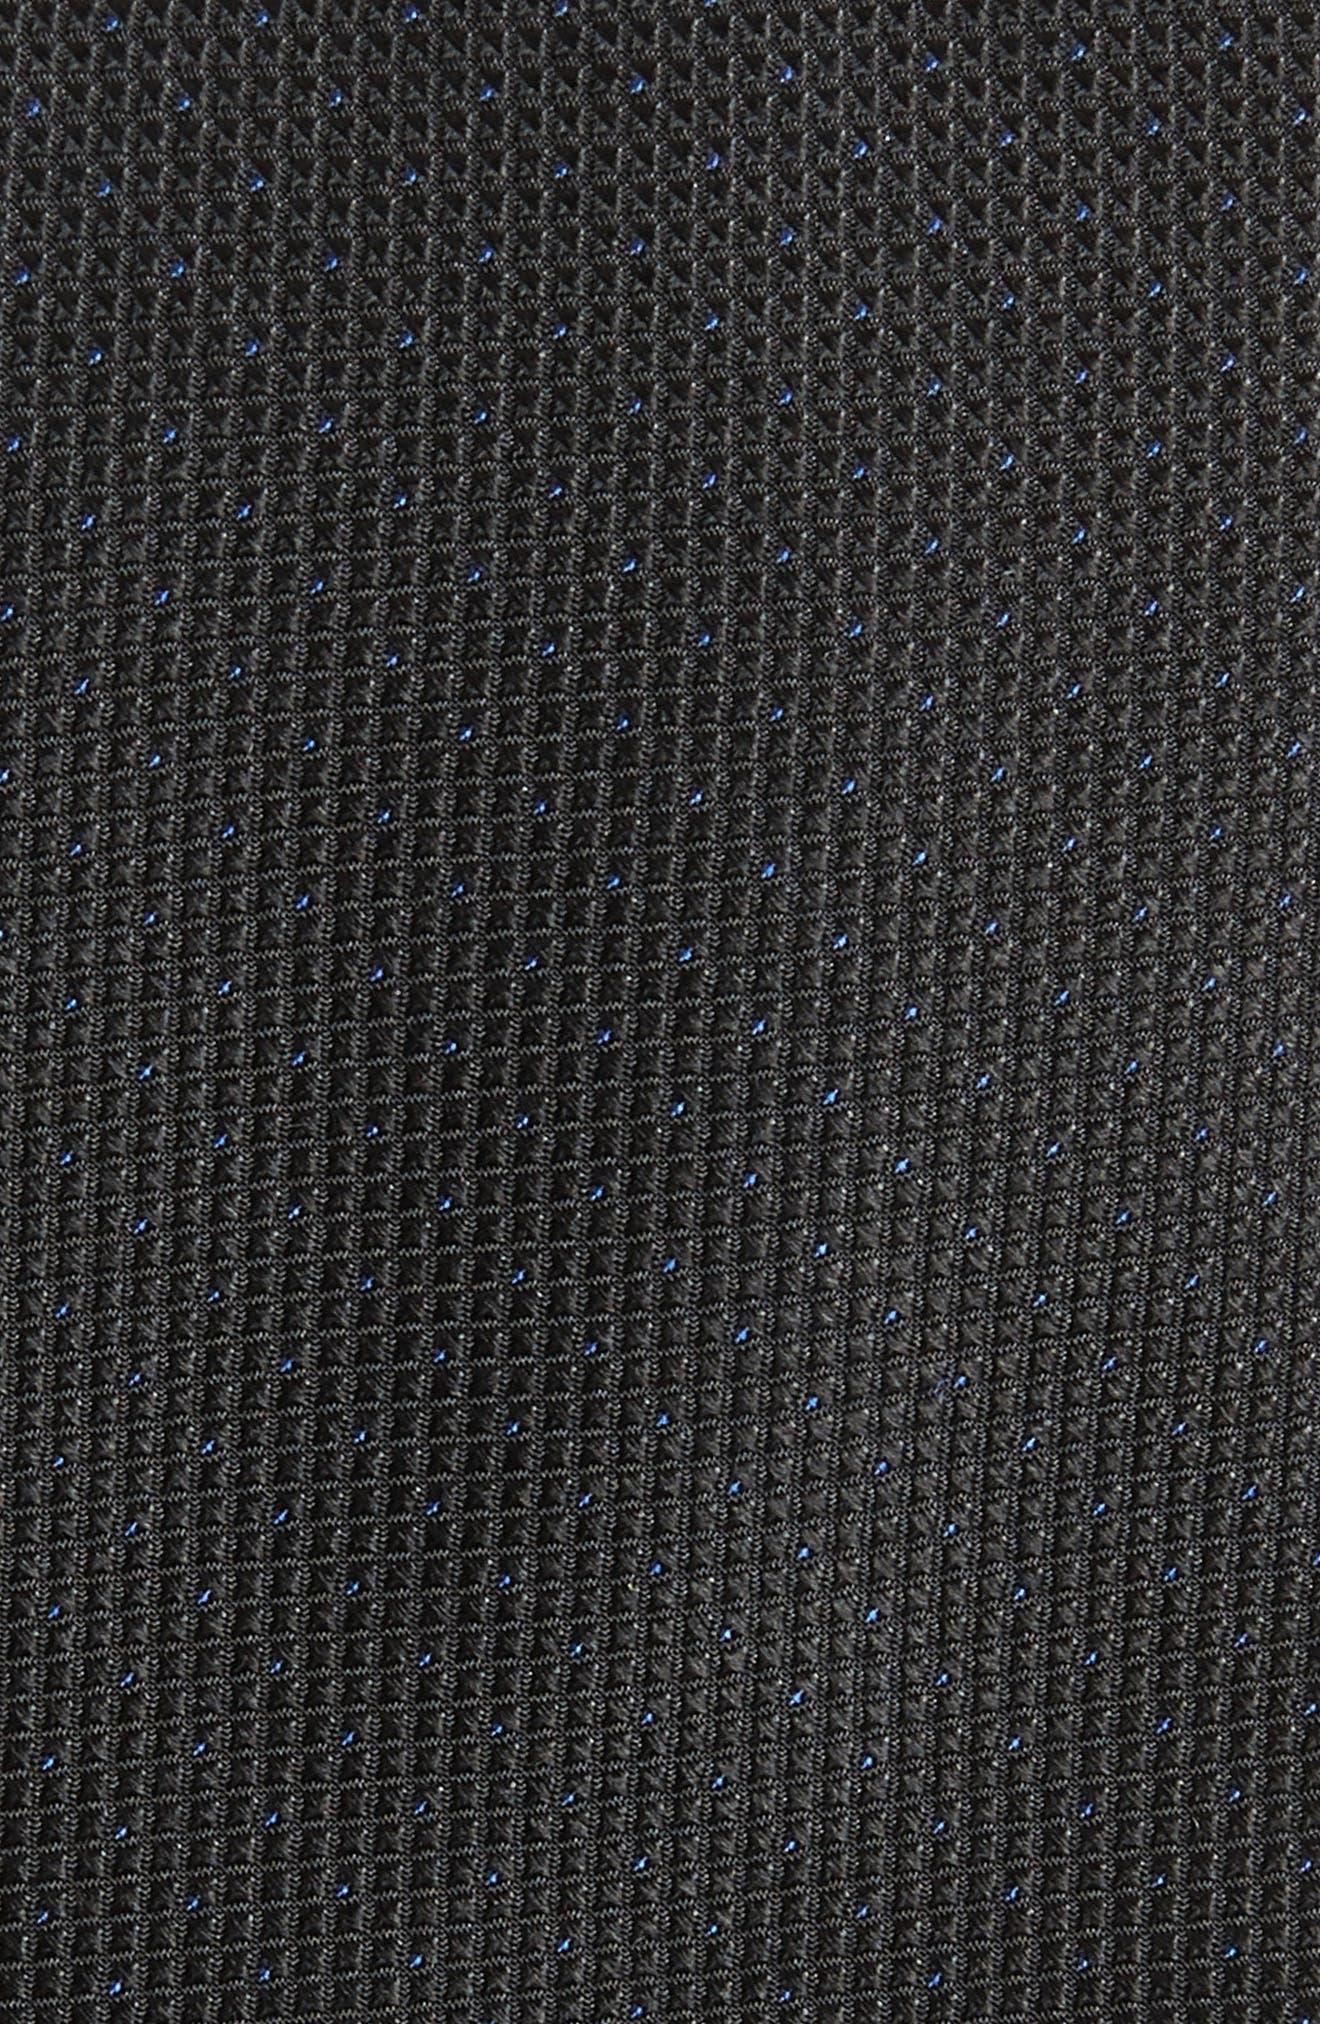 Chauncey Mini Silk Tie,                             Alternate thumbnail 2, color,                             001